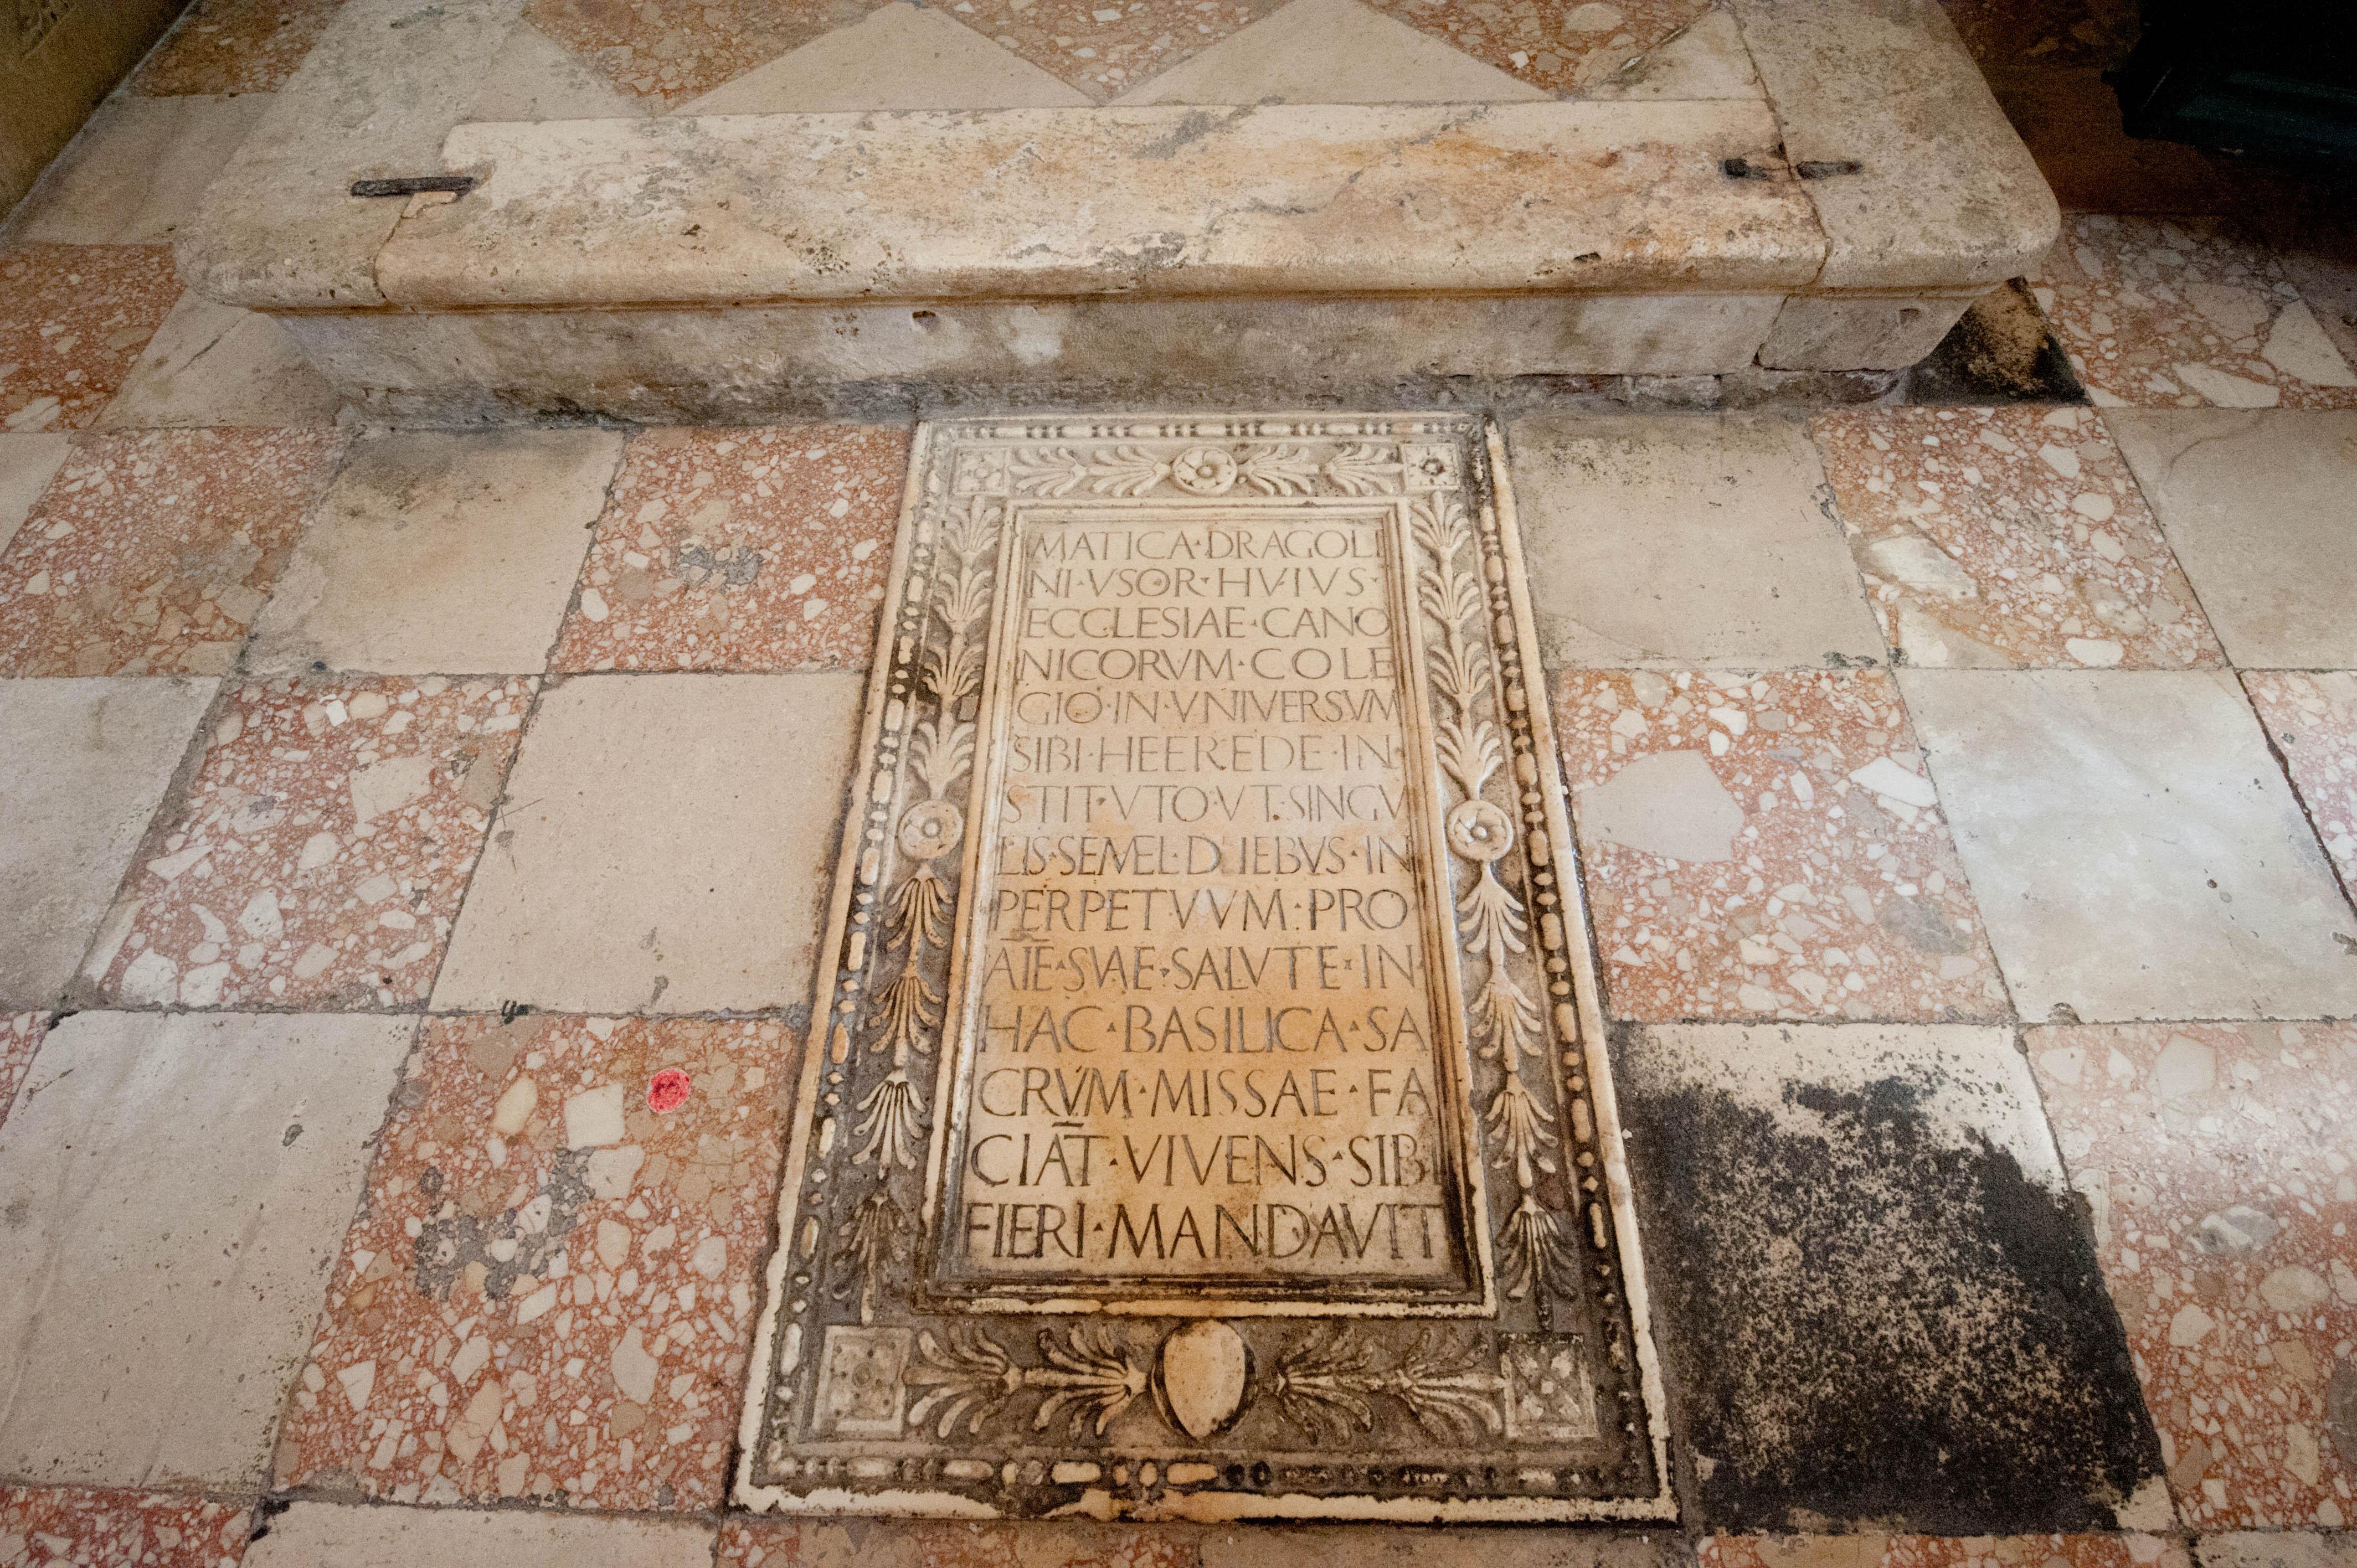 0480-Trogir(Dalmatie centrale)